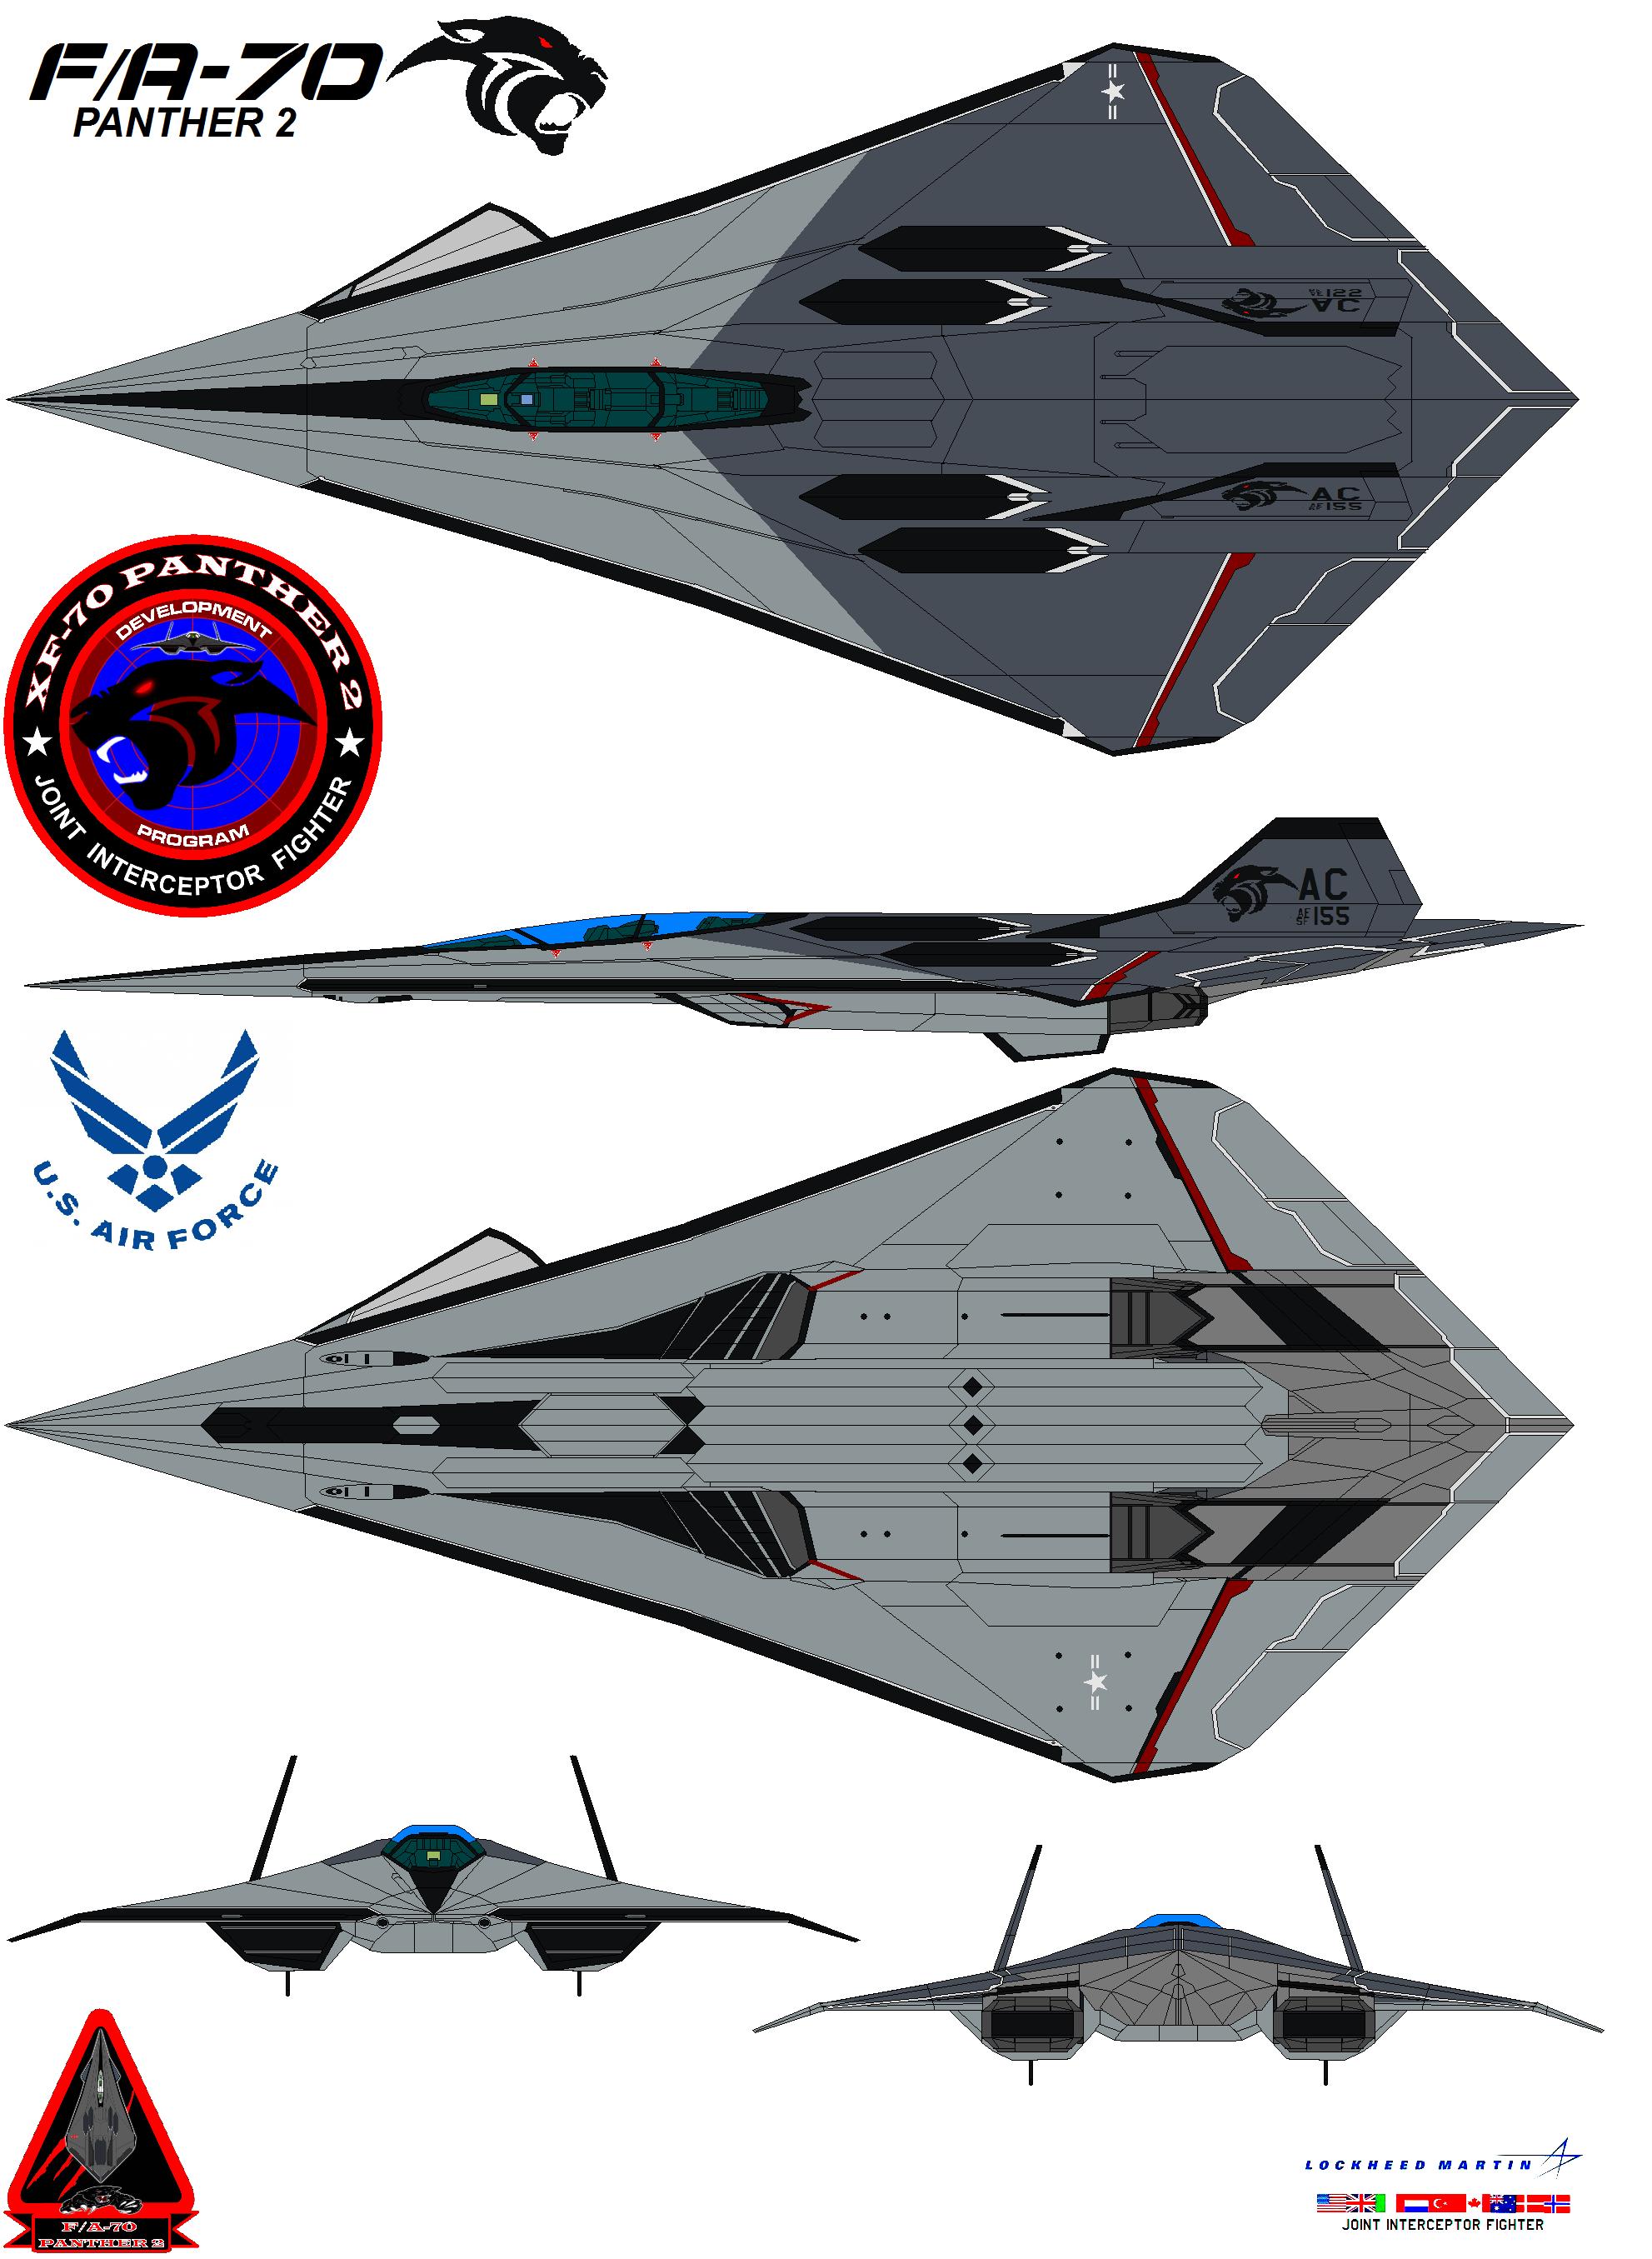 Lockheed  fa-70  Panther 2 USAF by bagera3005